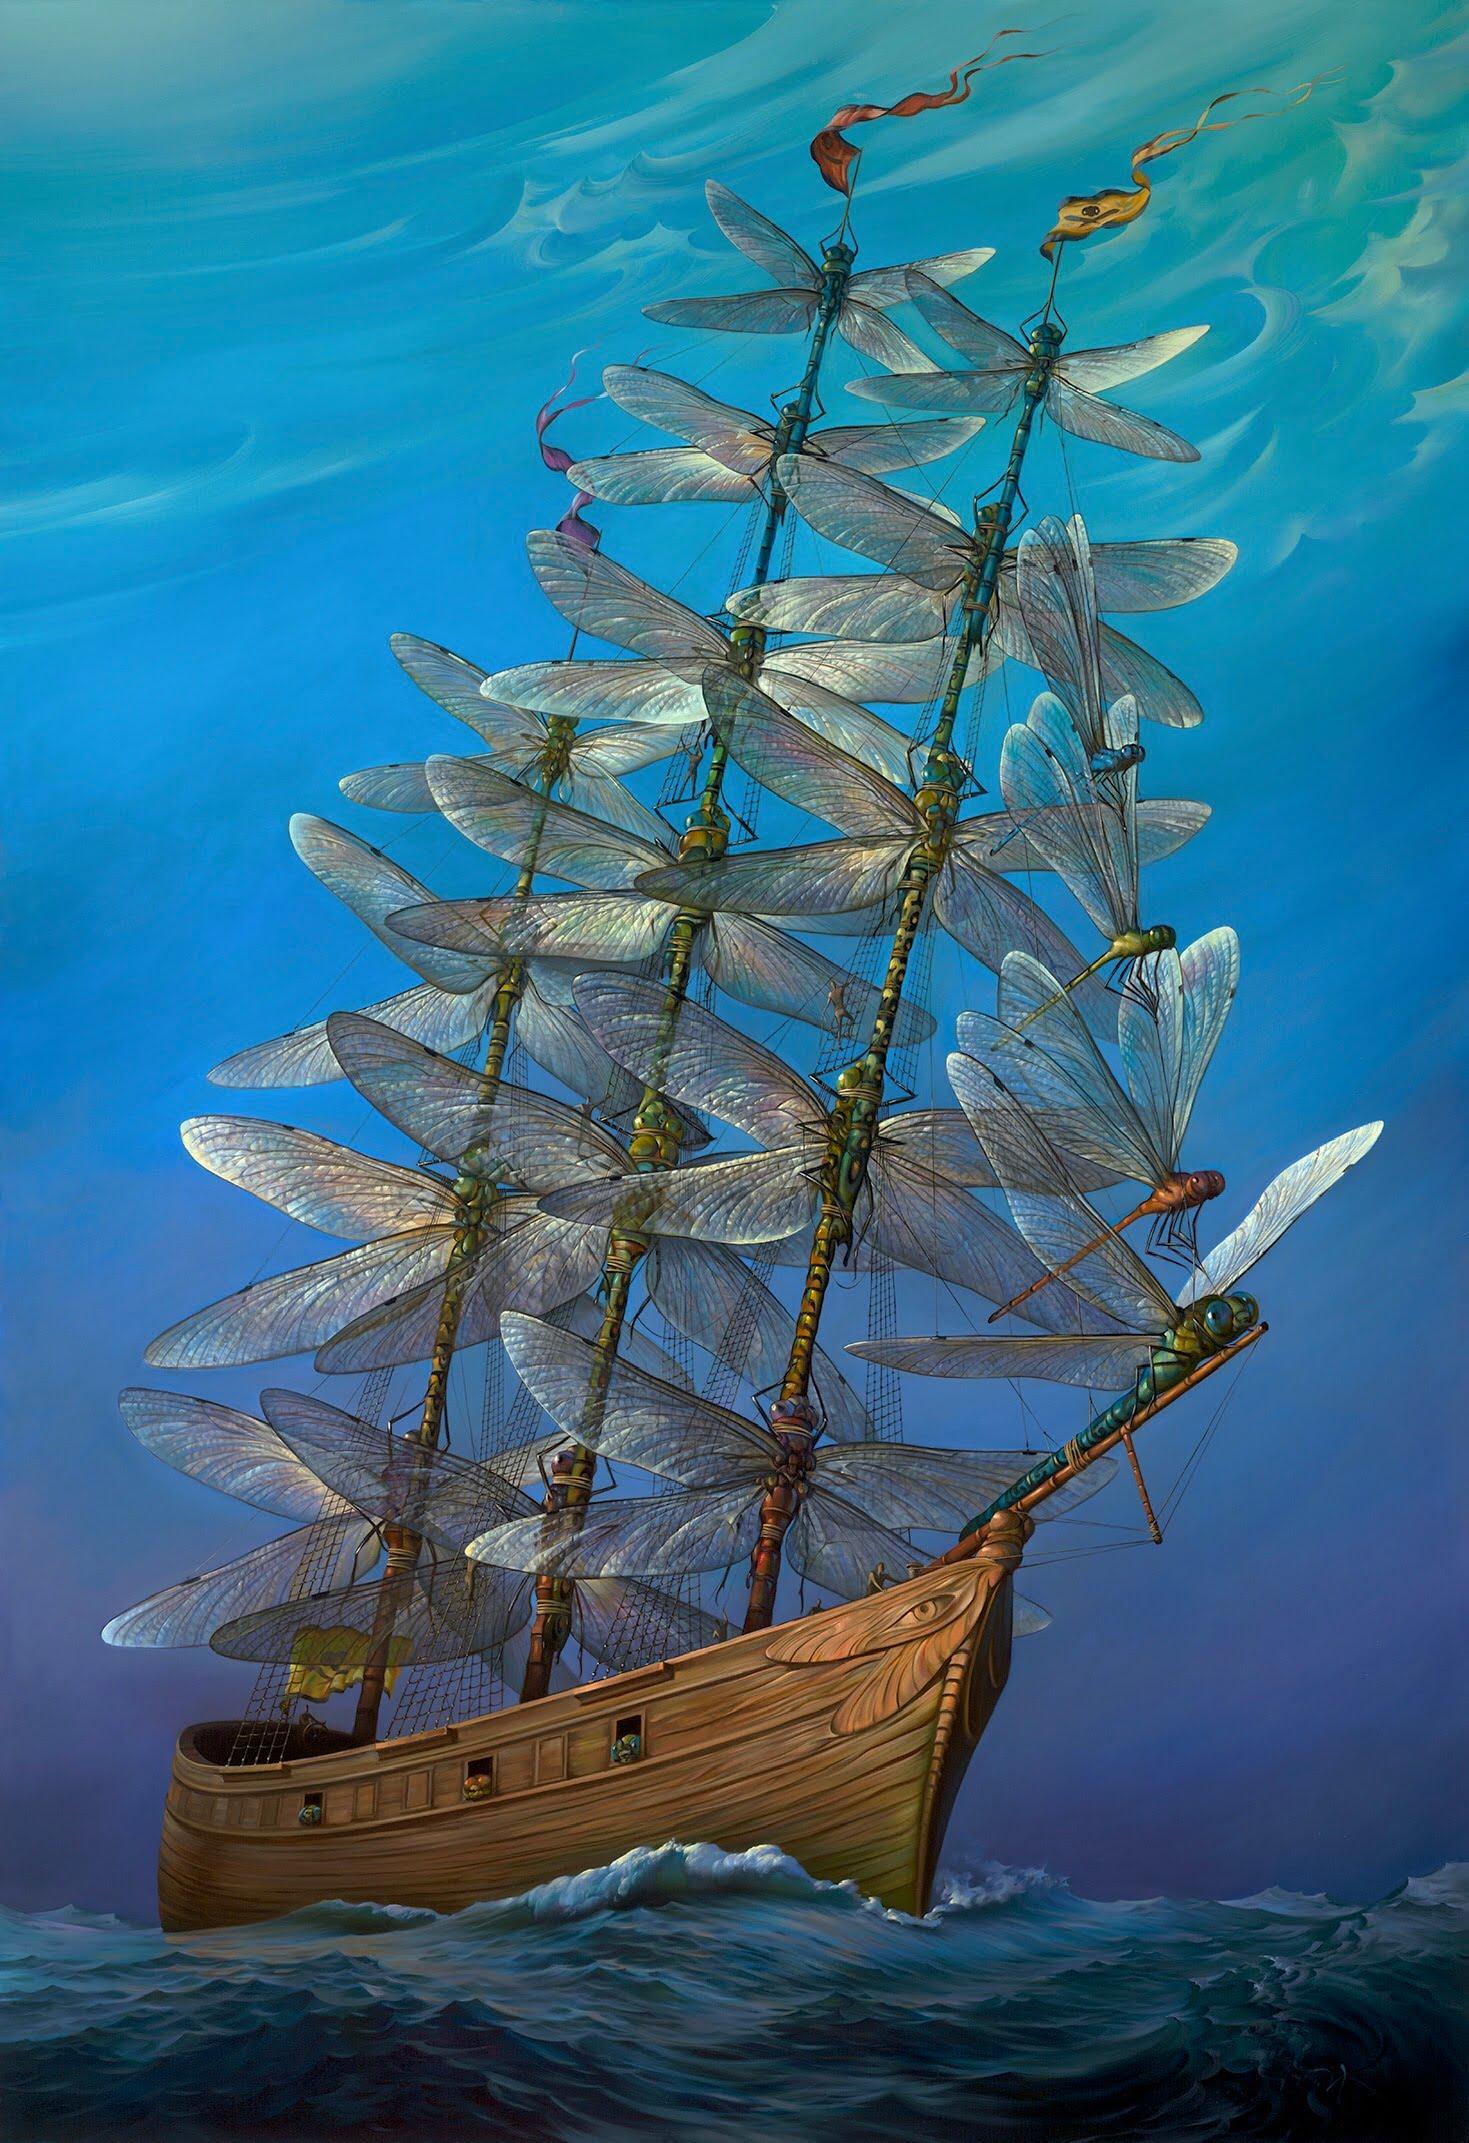 Vladimir Kush Presents His Latest Artwork 'In Full Sail'